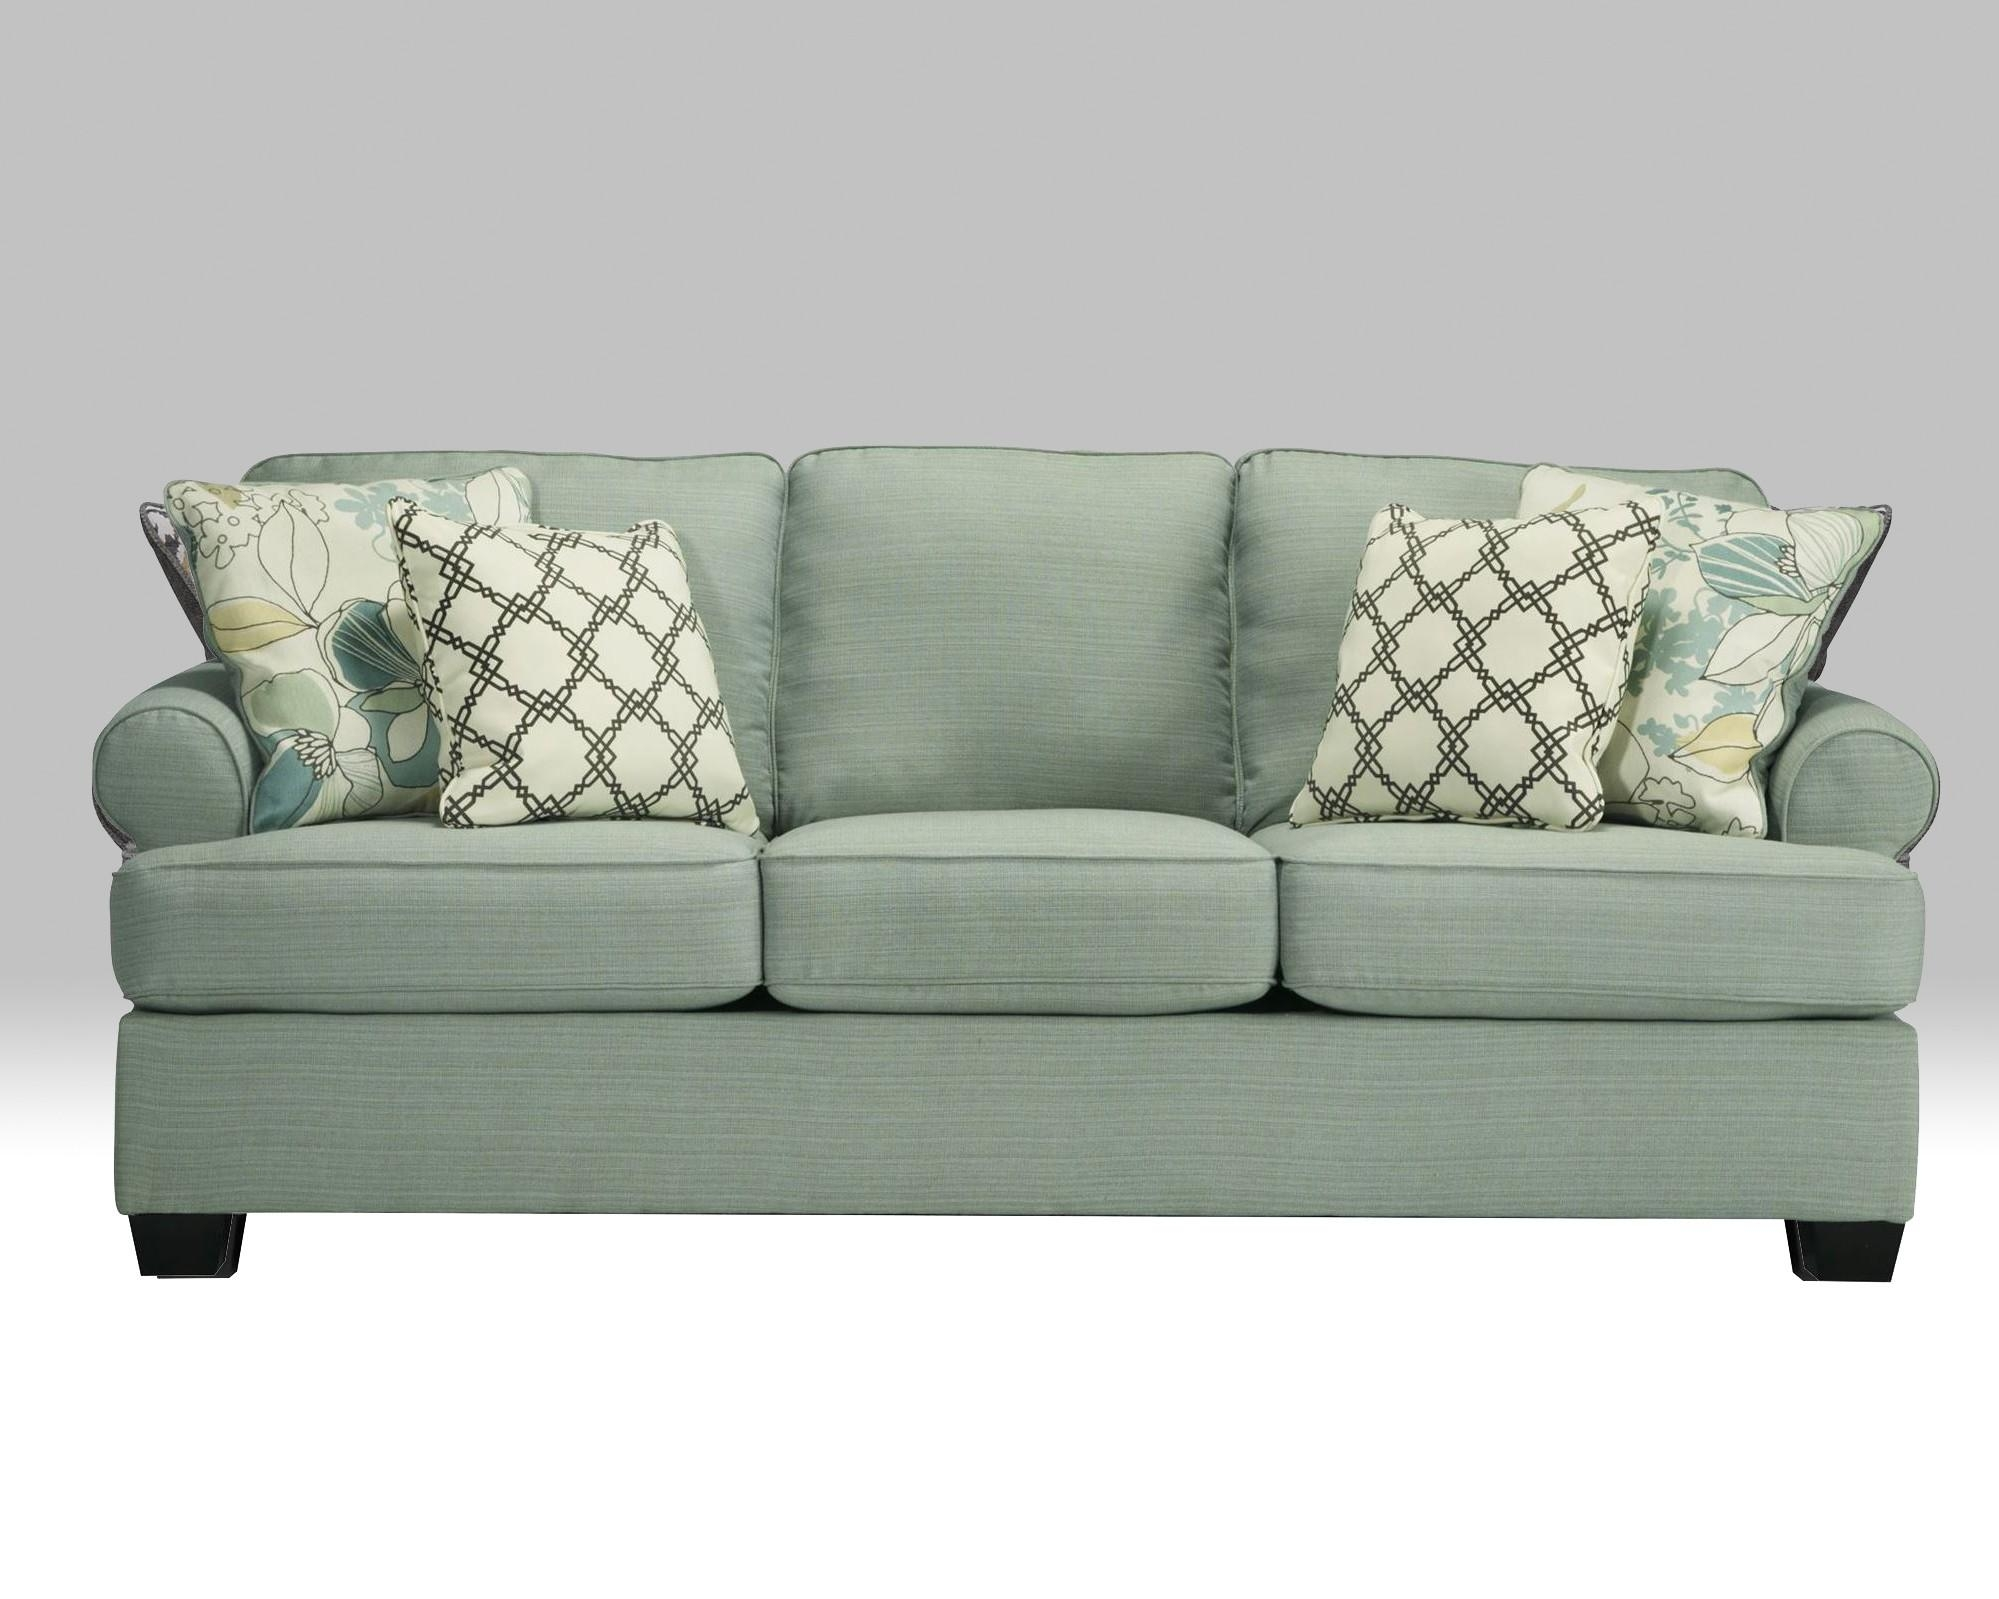 Daystar Seafoam Sofa For $ (Image 9 of 20)